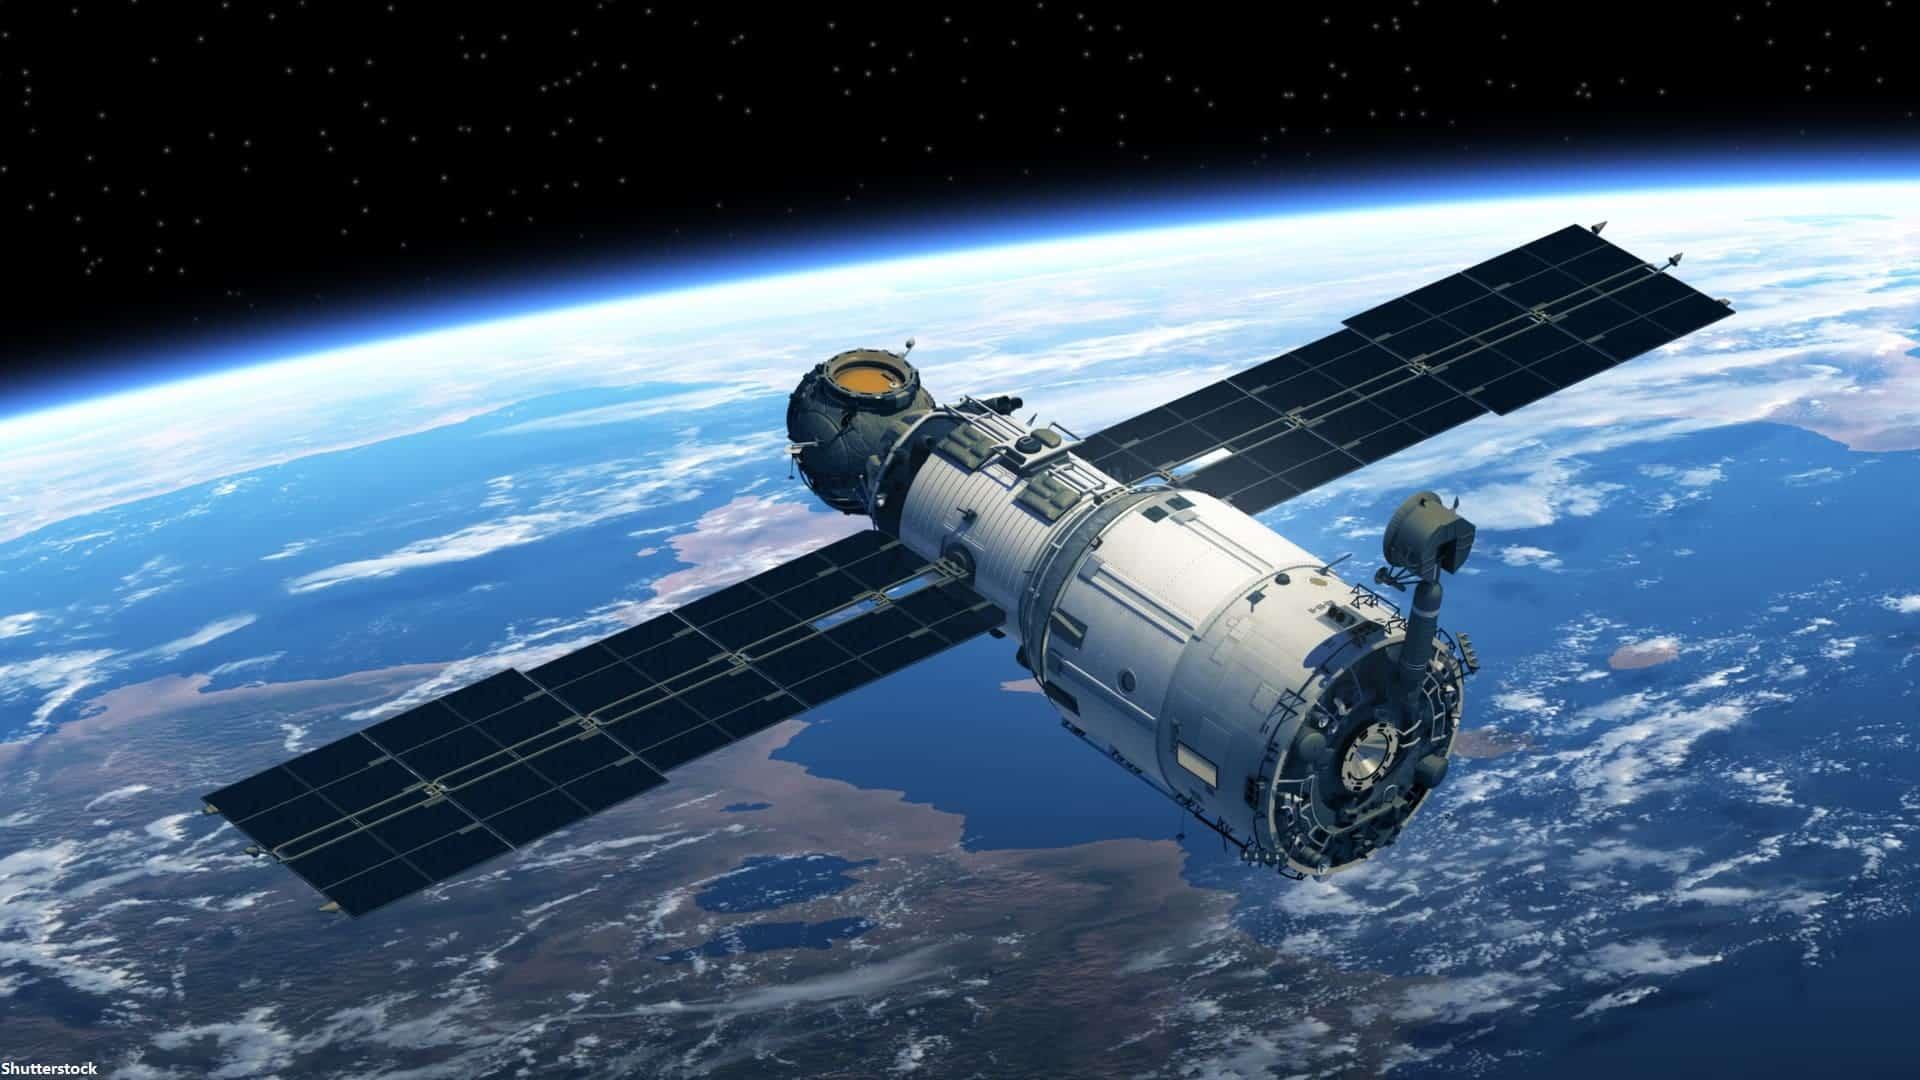 hackear satélites